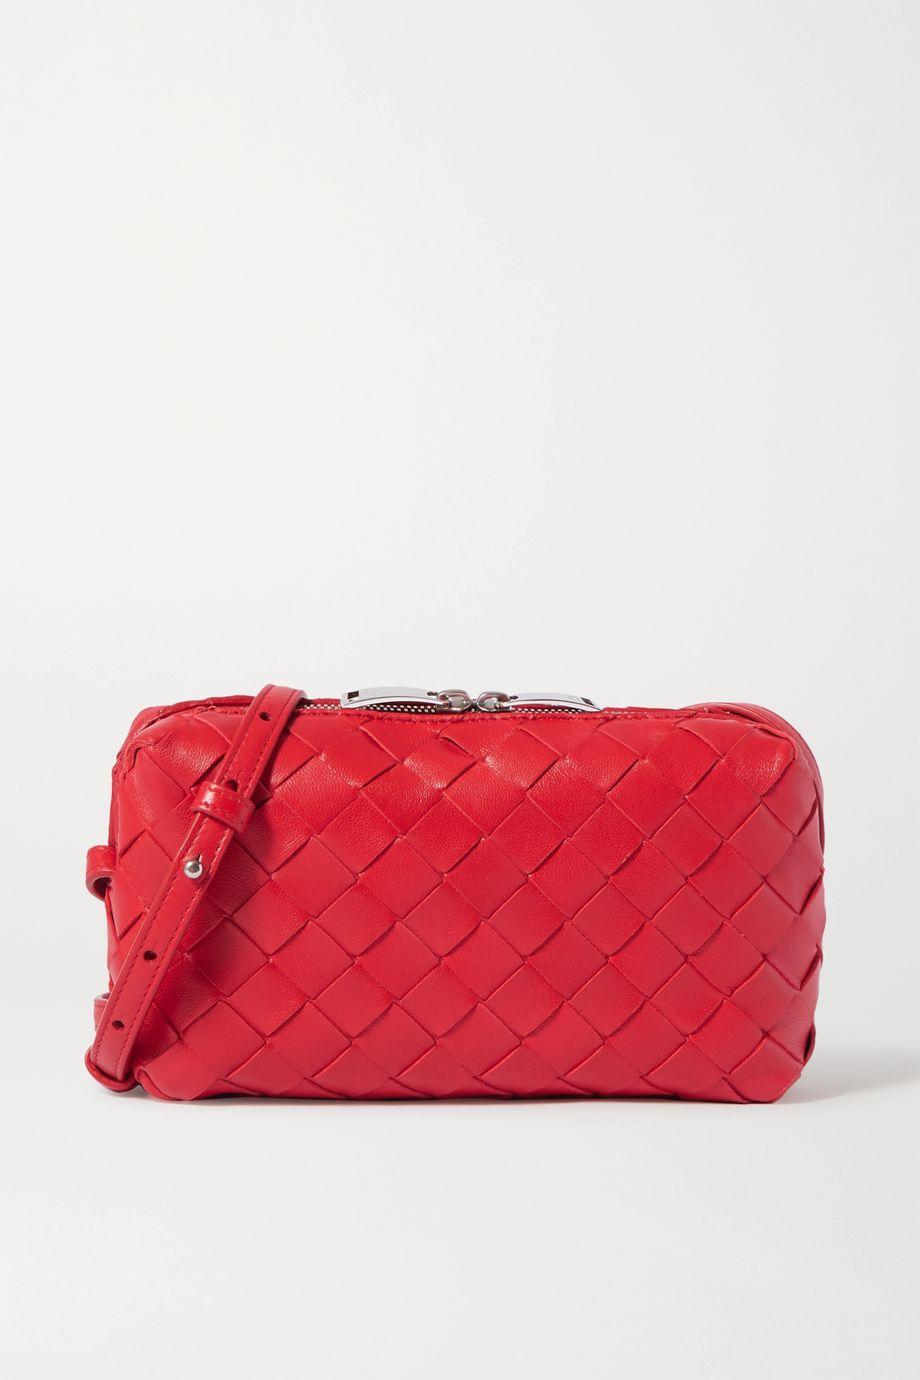 Bottega Veneta Small intrecciato leather shoulder bag